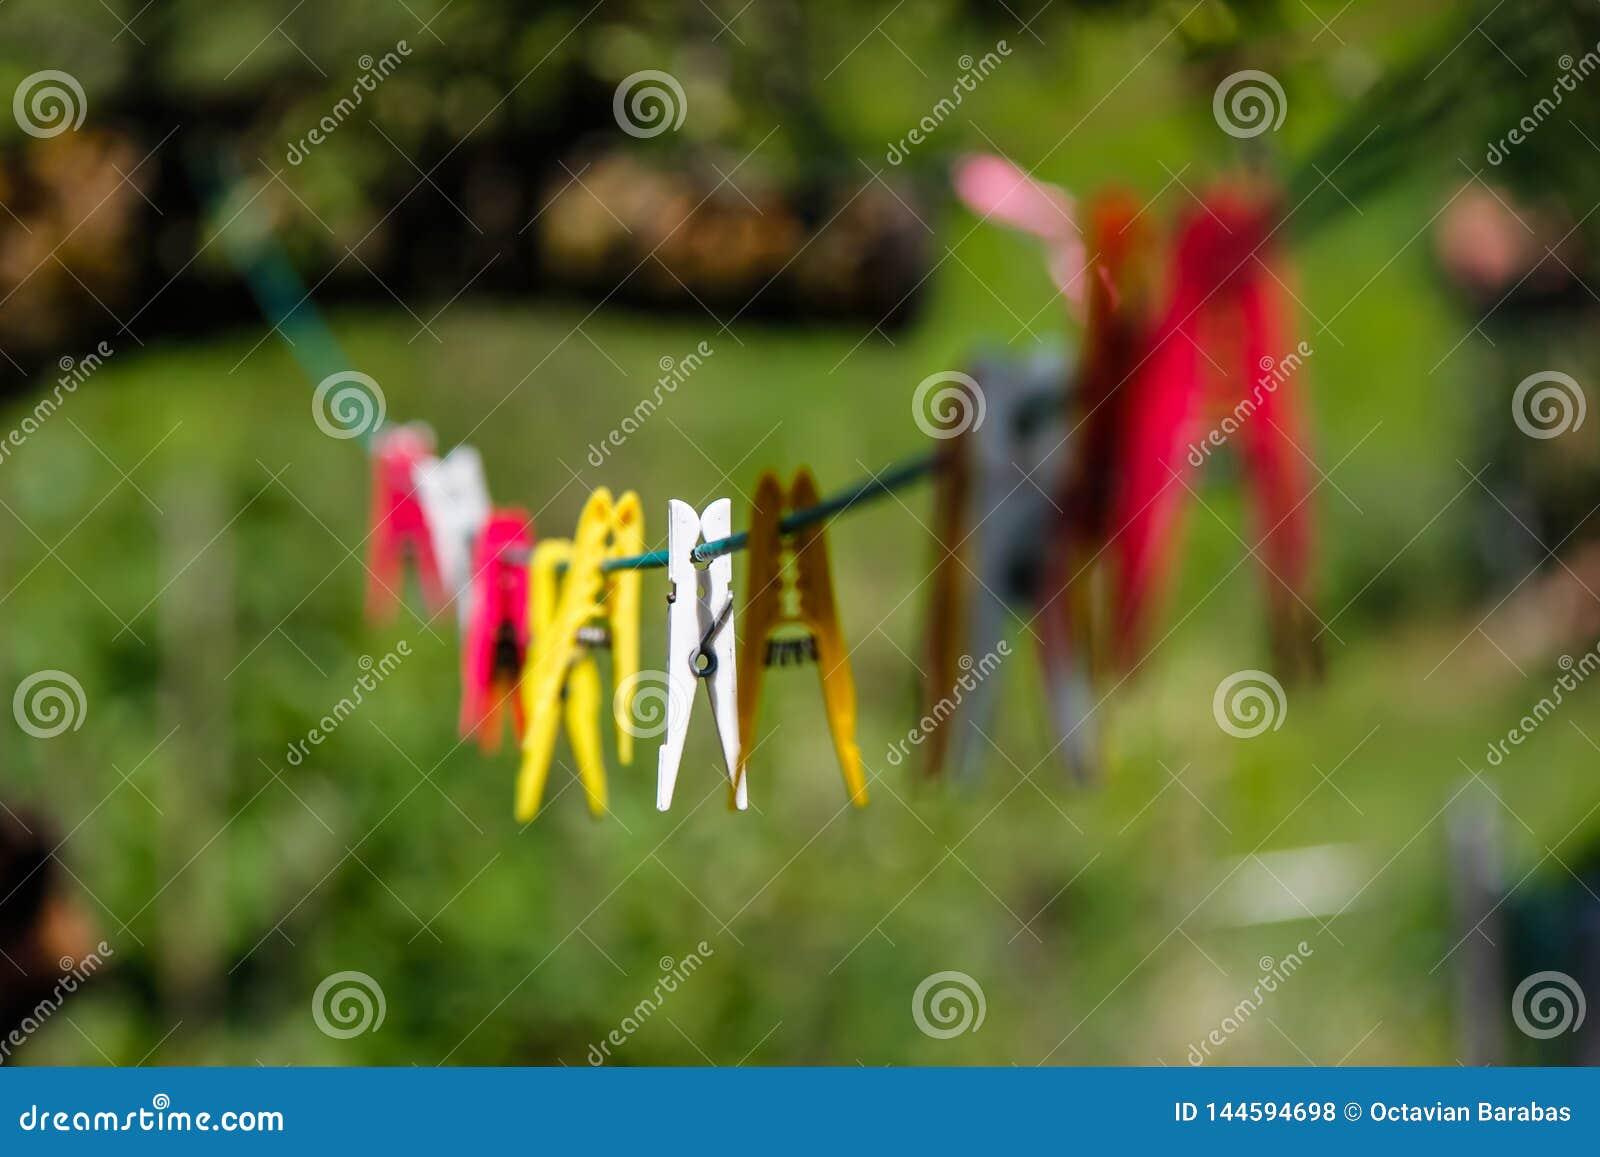 Pegs de roupa coloridos na linha